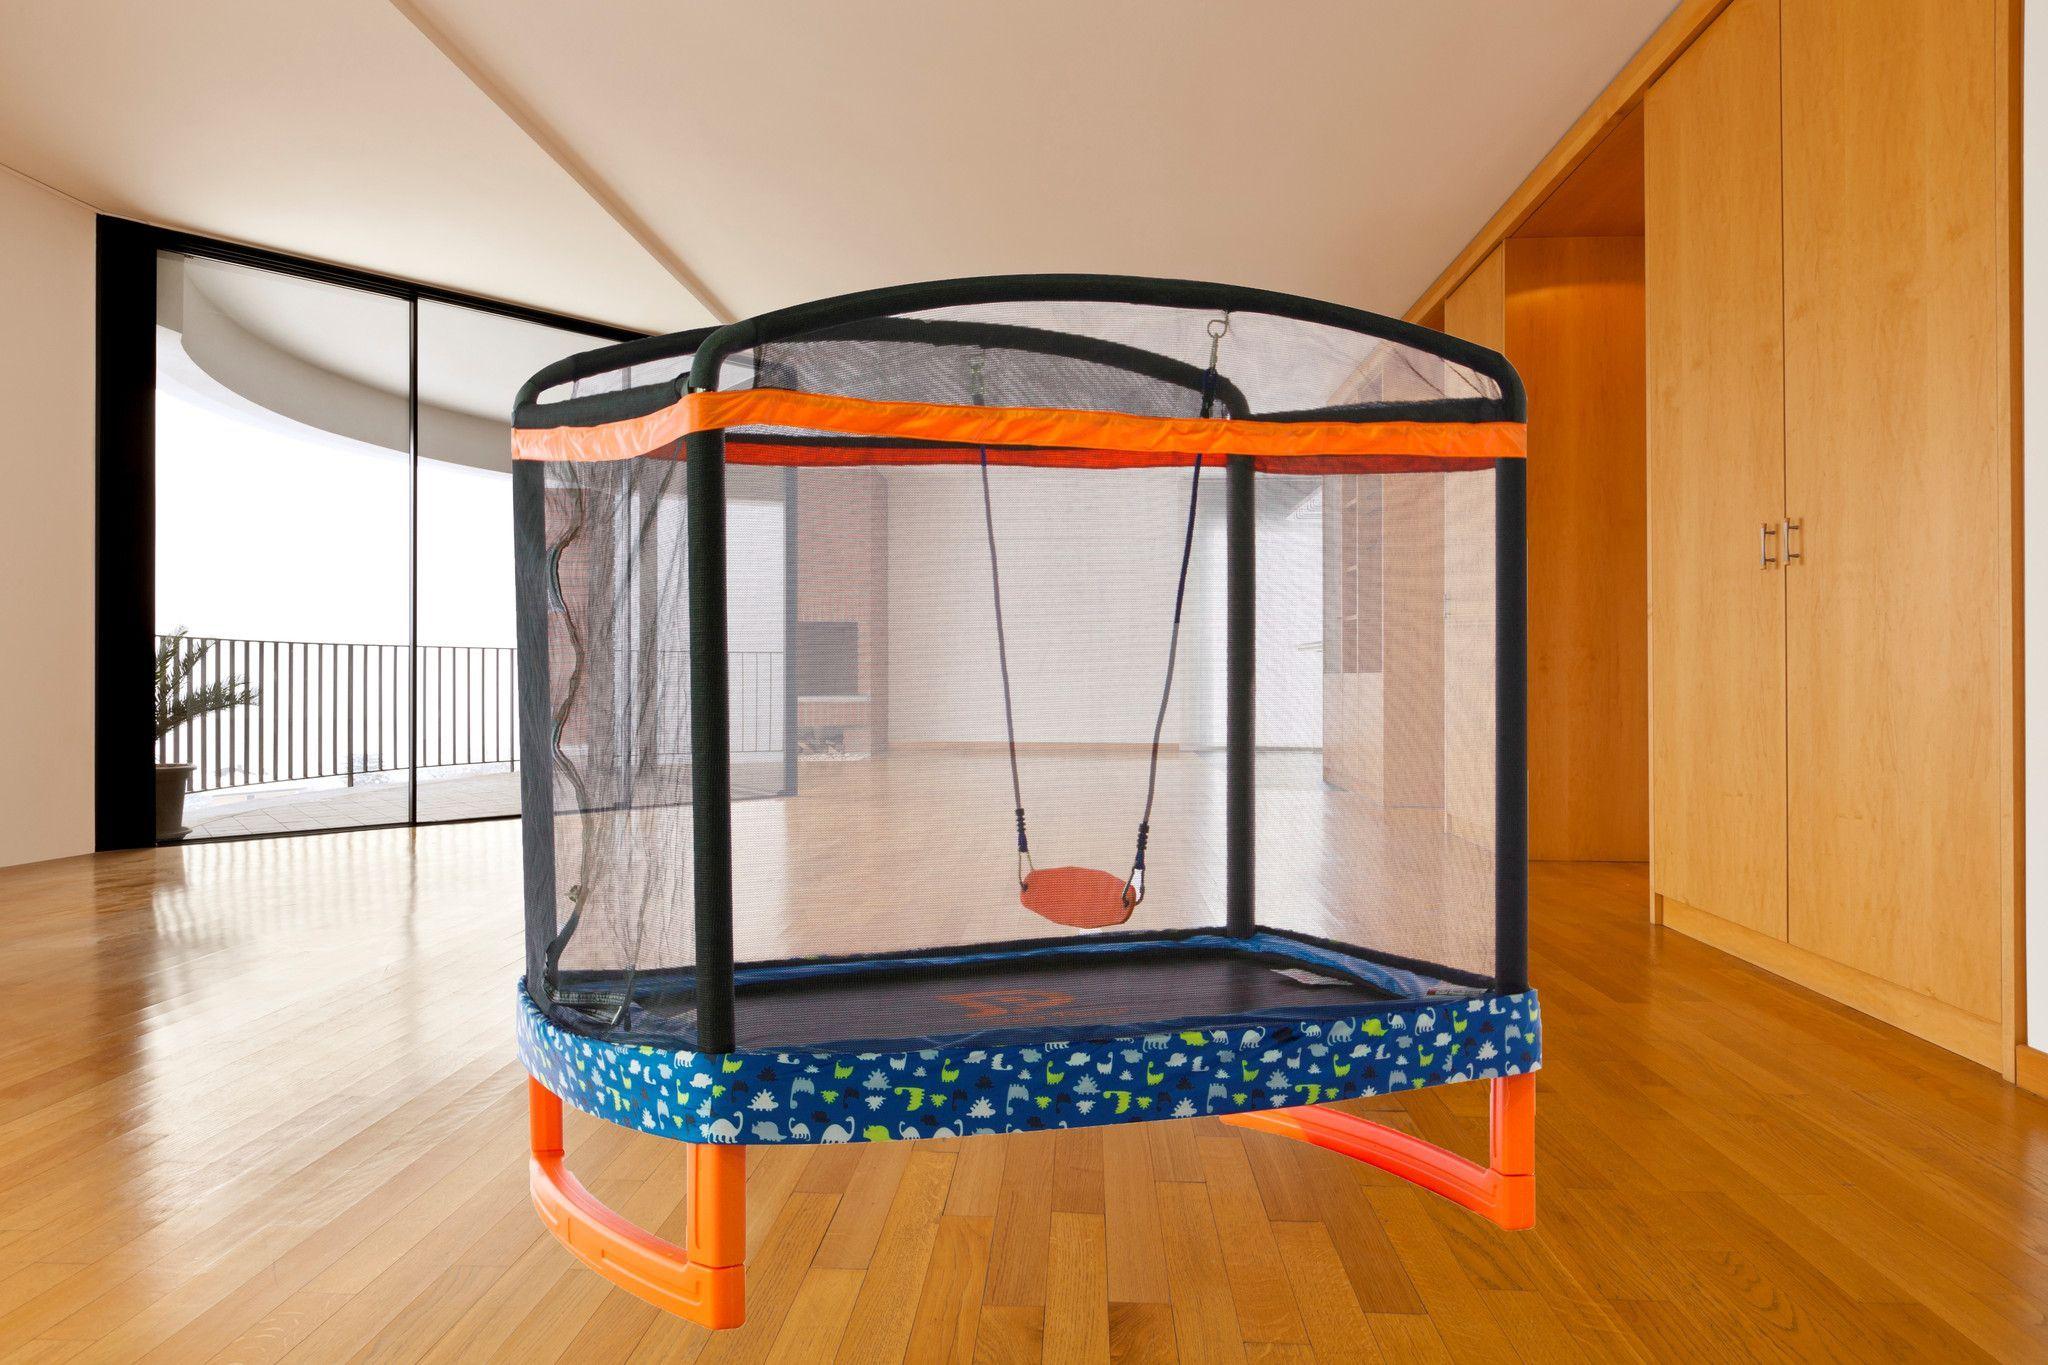 72 x 50 rectangle indooroutdoor trampoline safety net